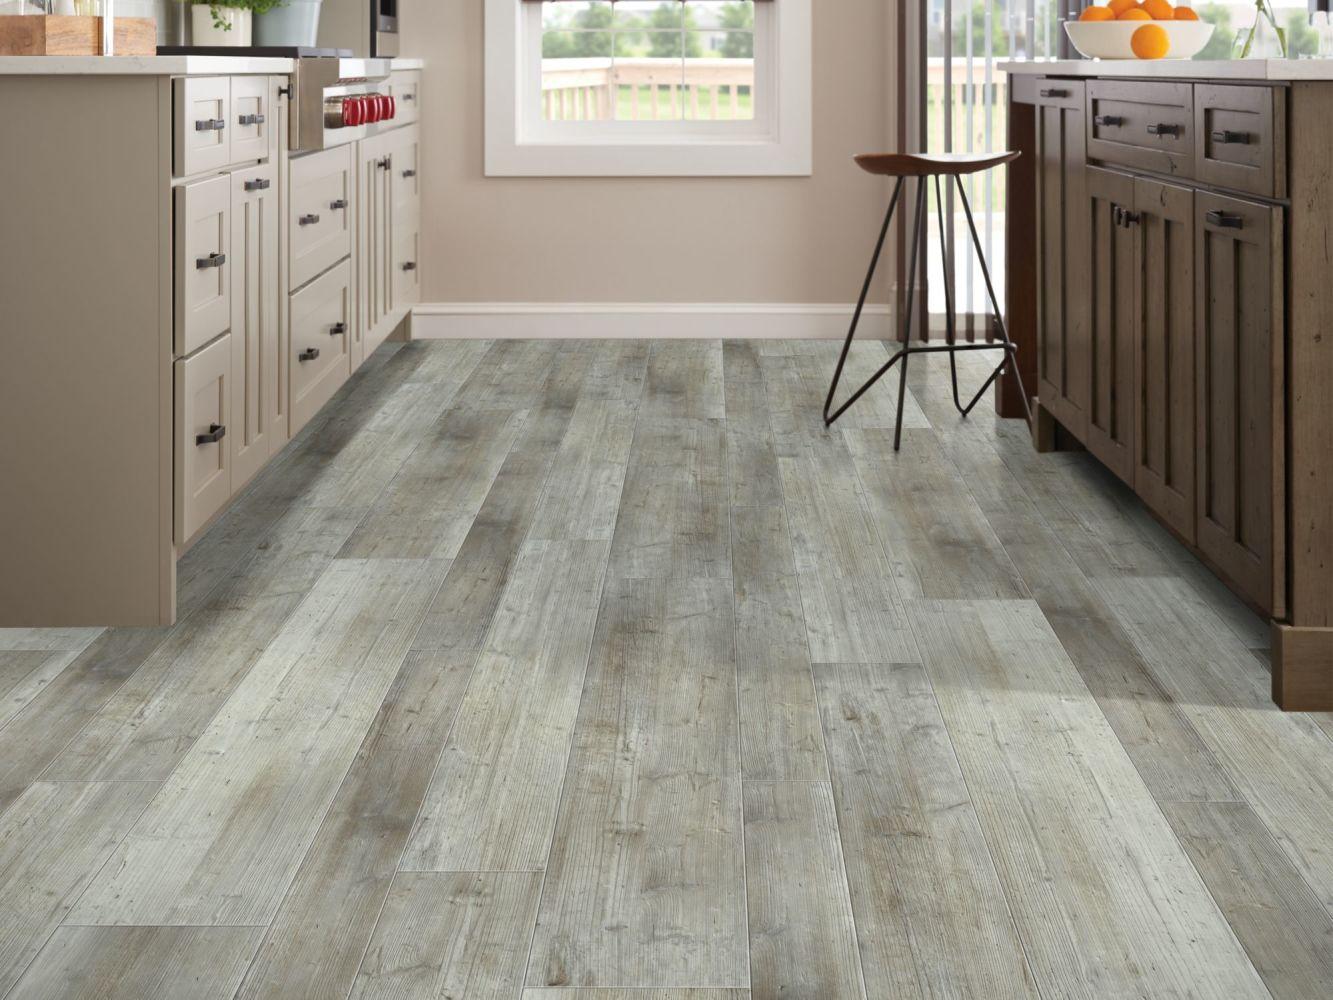 Shaw Floors Reality Homes Fremont Mixed Distinct Pine 05039_108RH